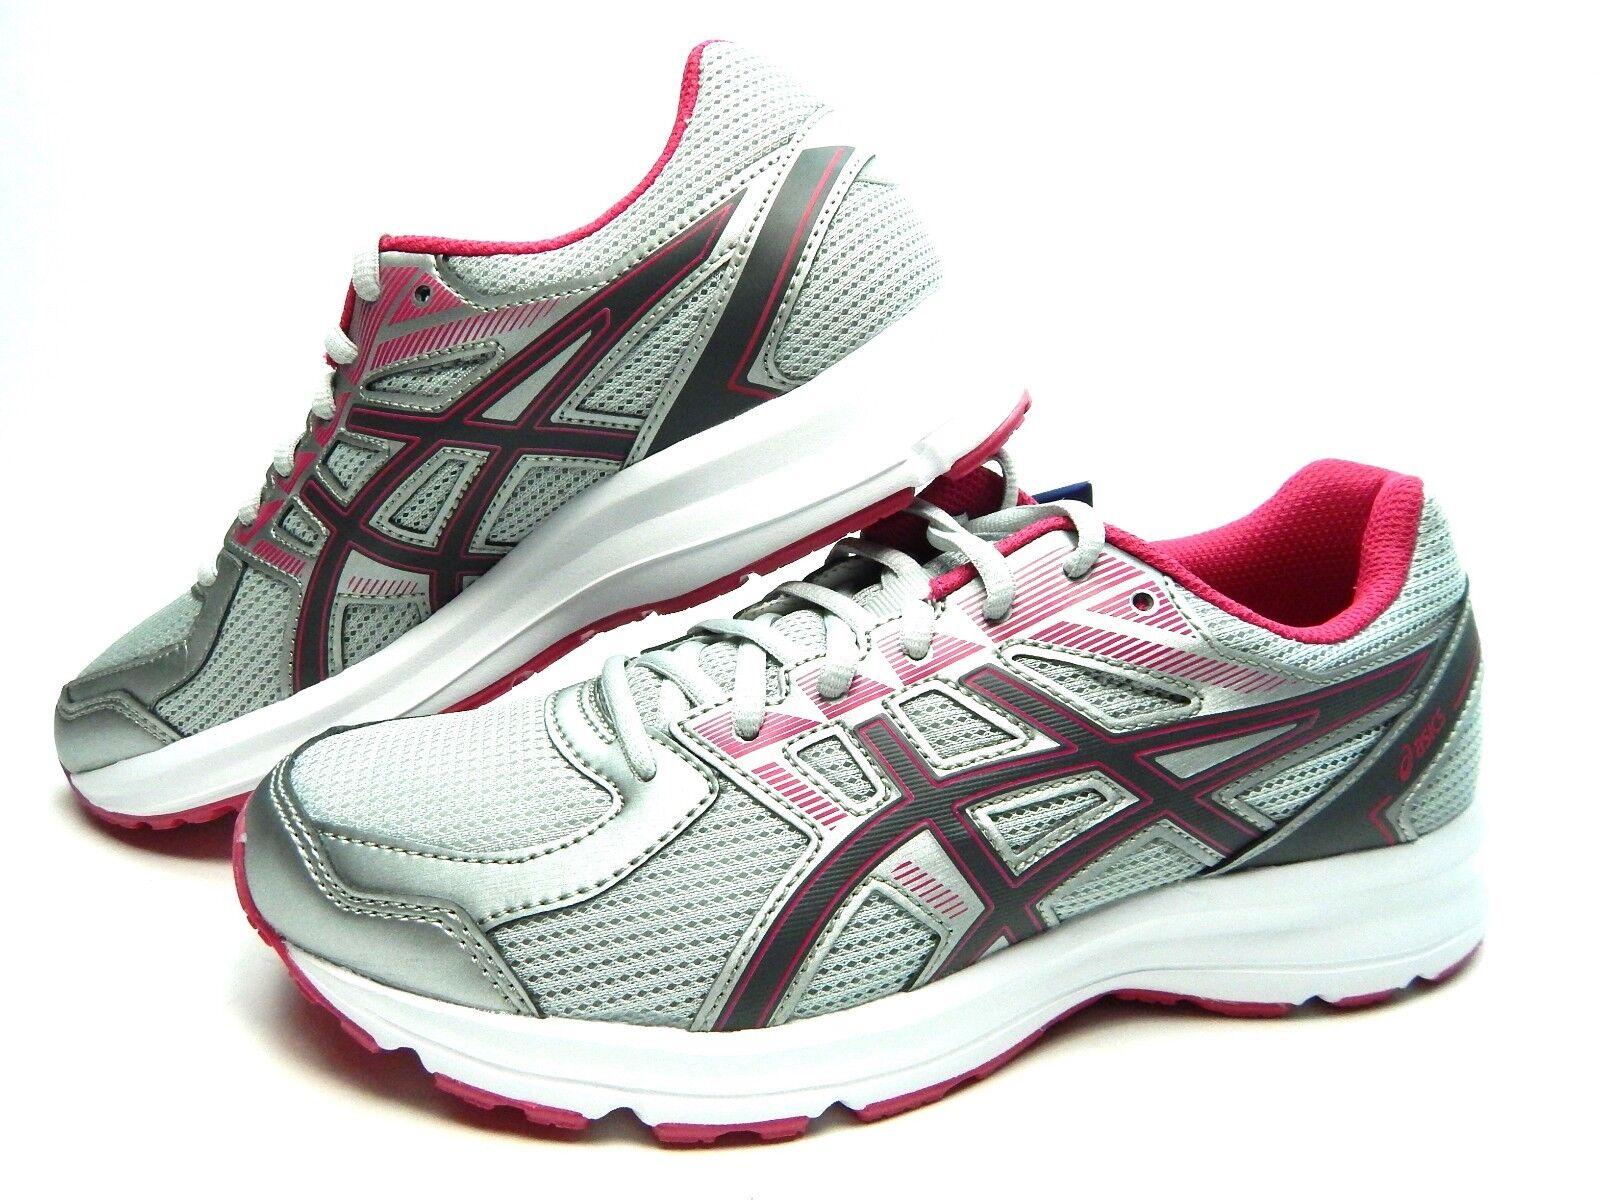 Asics Jolt femmes chaussures  Glacier grey carbon Bright rose T7K8N 9697 Tailles 6-12